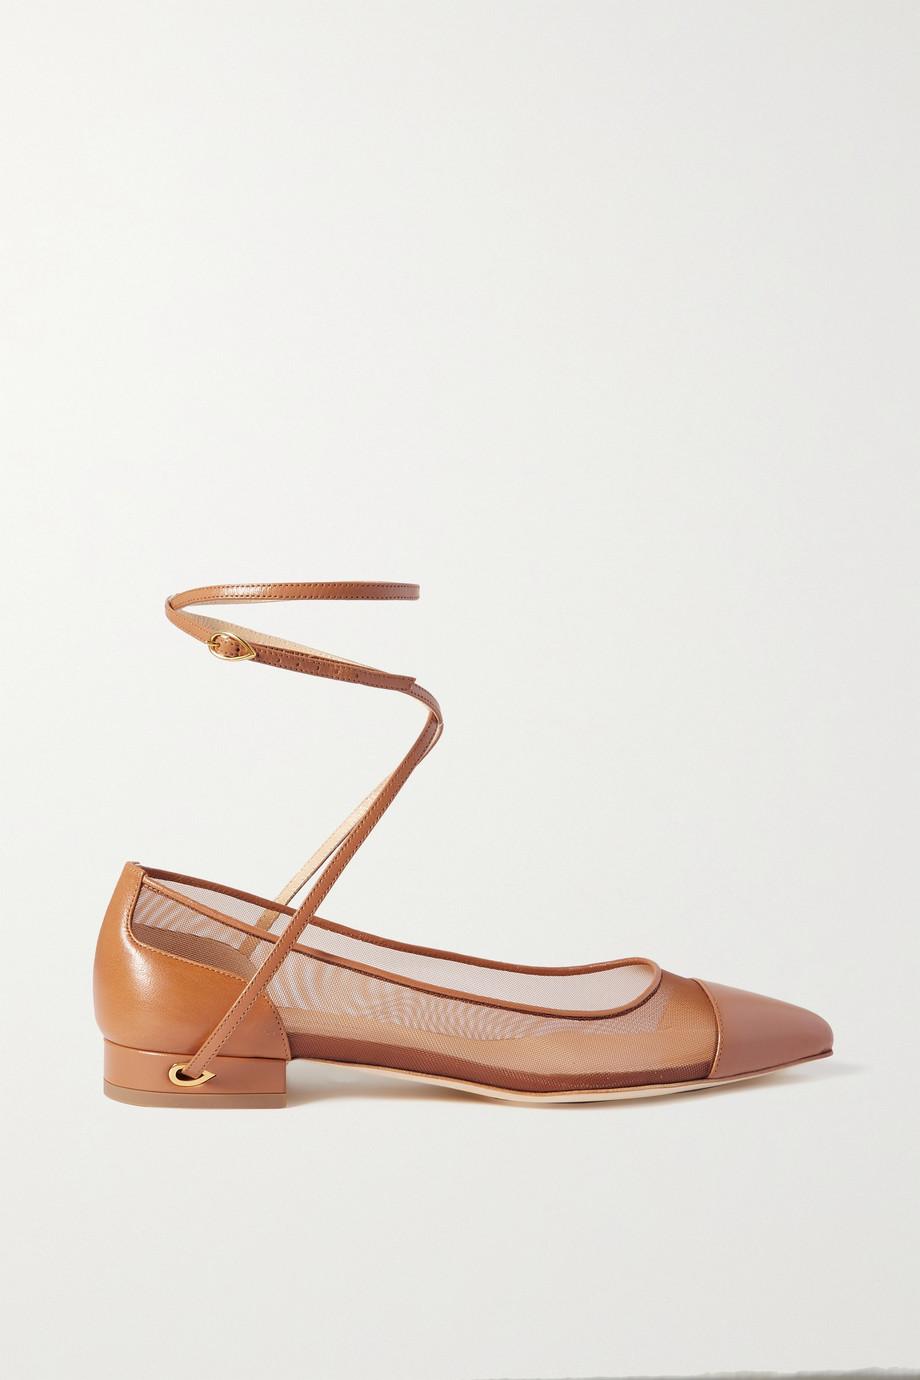 Jennifer Chamandi Lorenzo 20 flache Schuhe mit spitzer Kappe aus Leder und Mesh